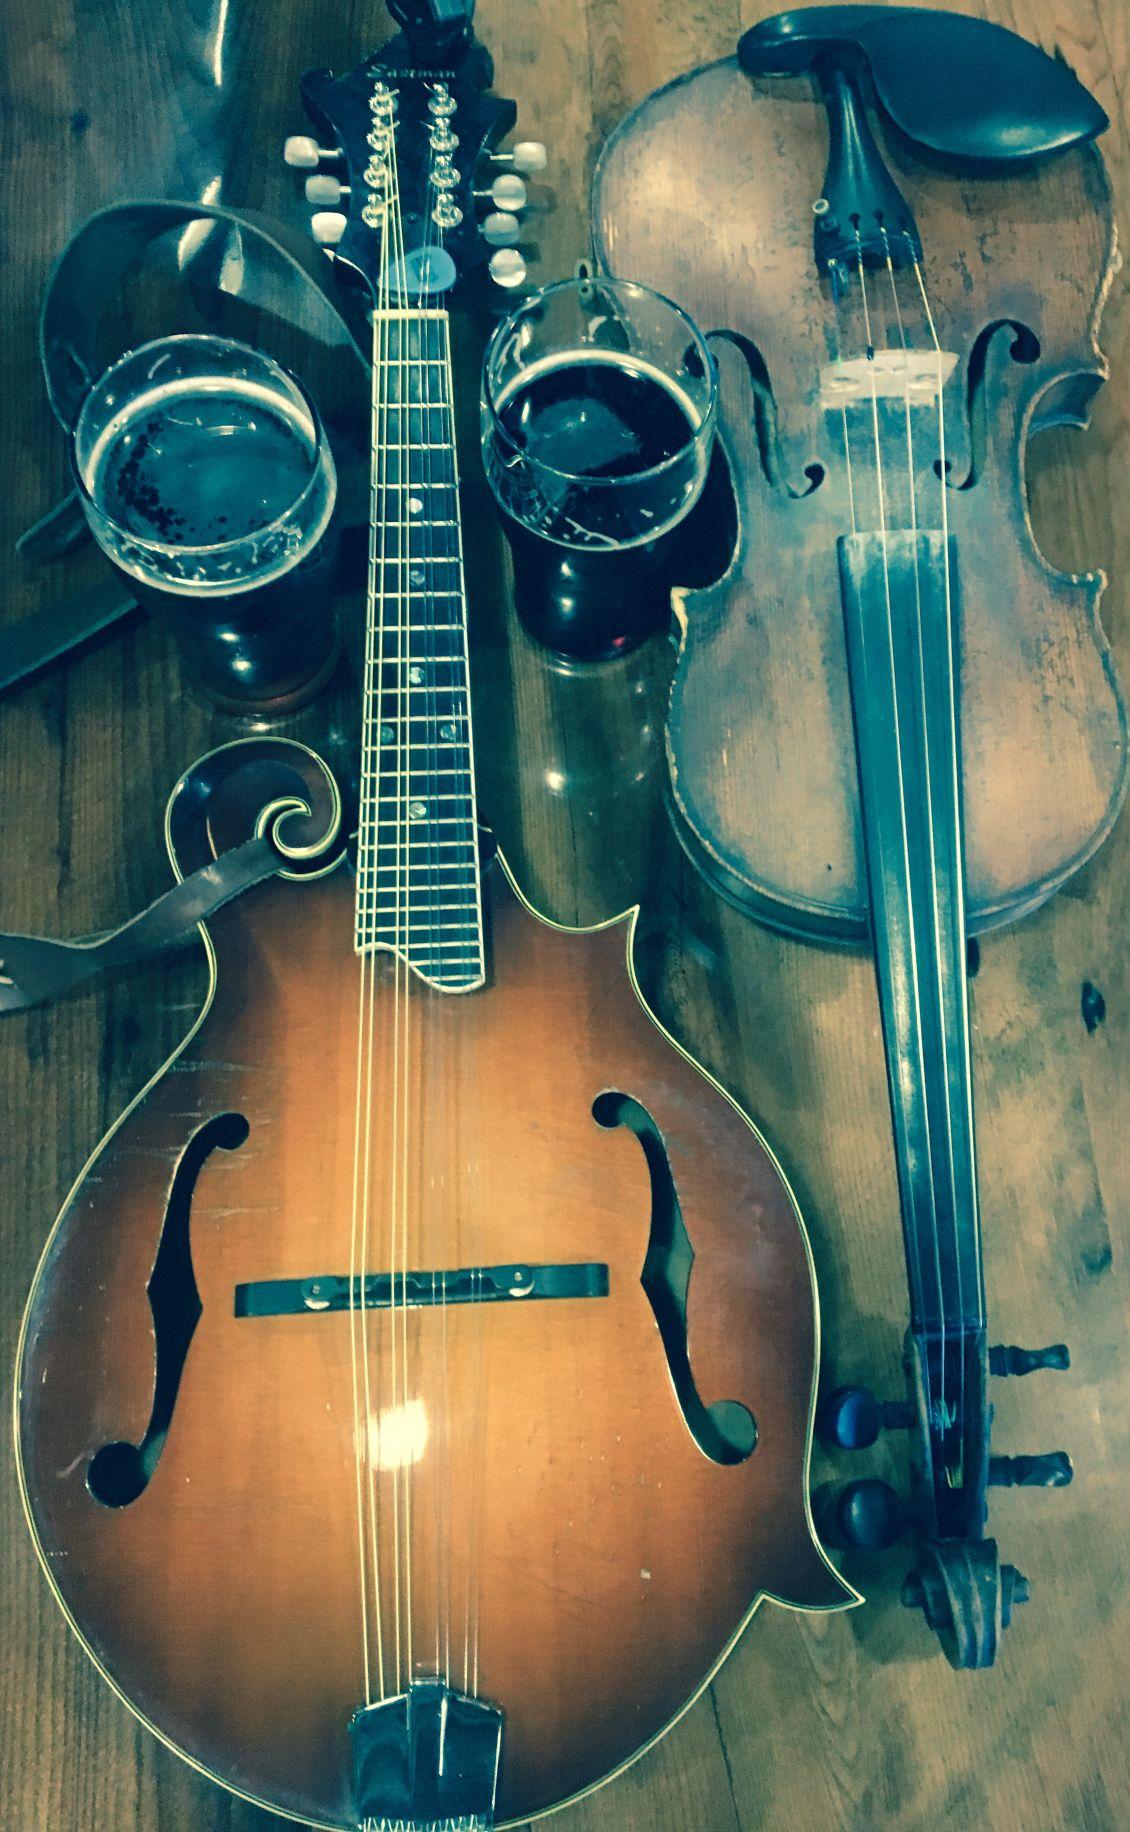 Pigtown Fling String Band